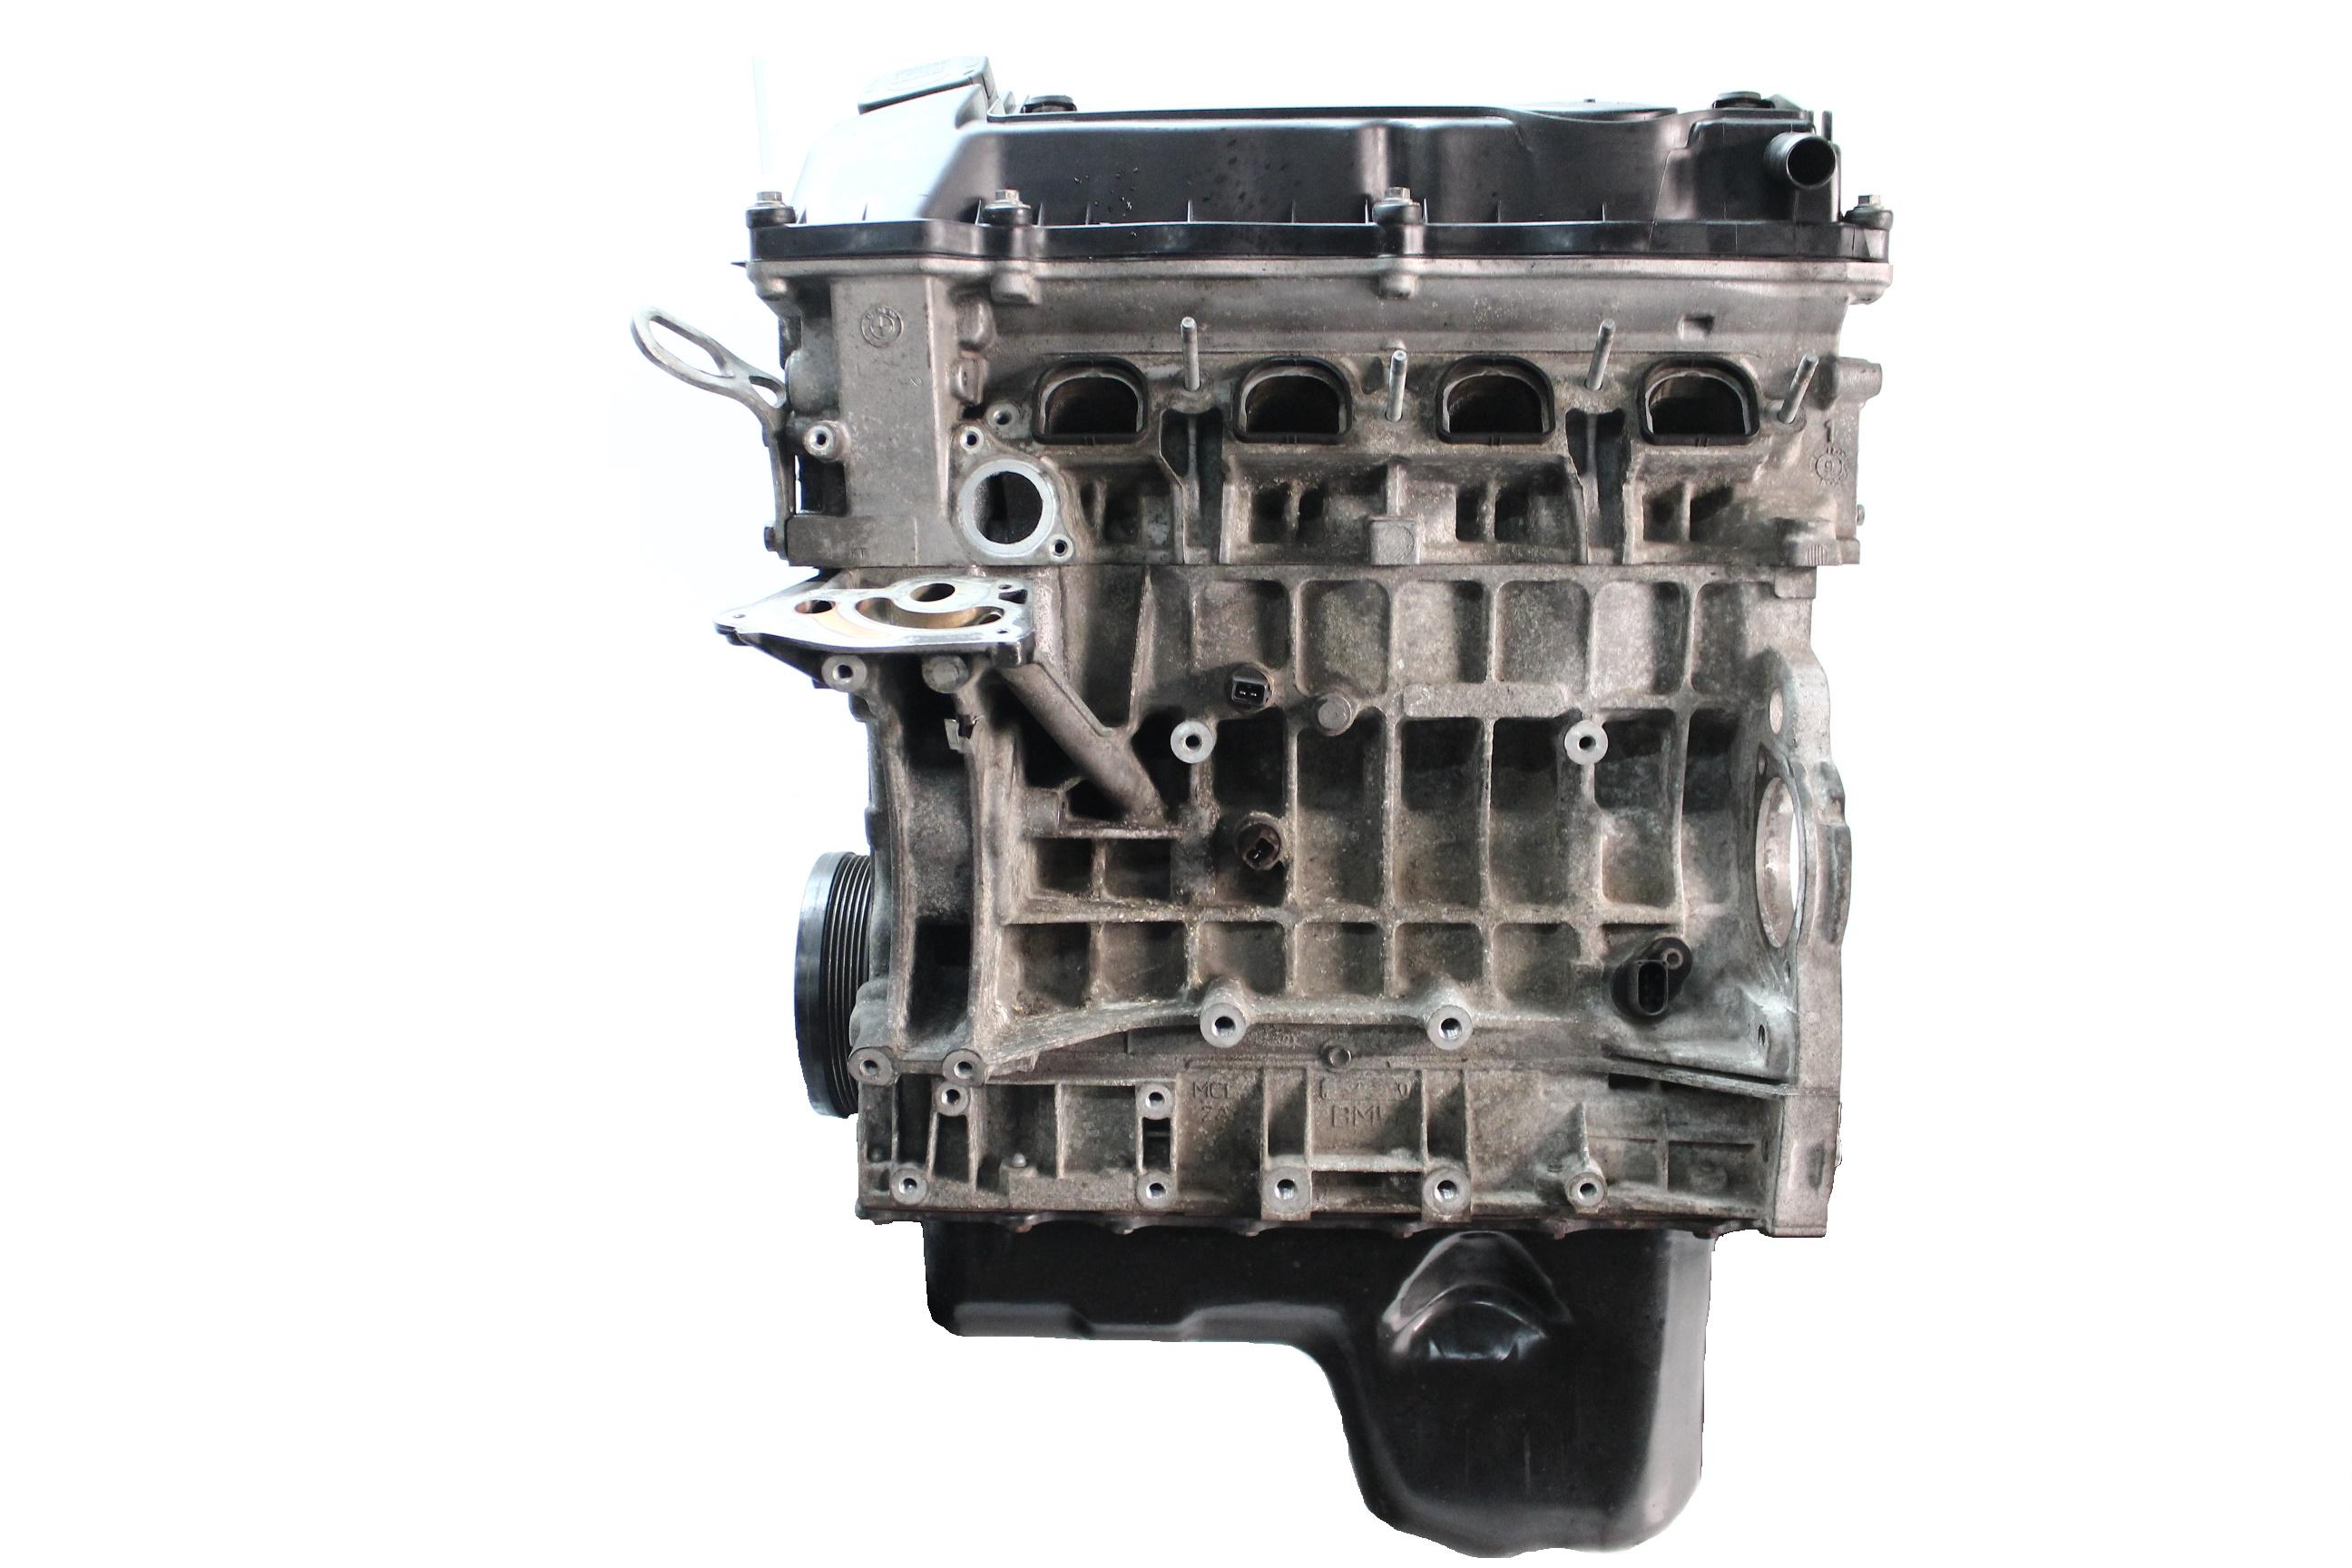 Motor 2006 BMW 1,6 i N45B16A N45 115 PS